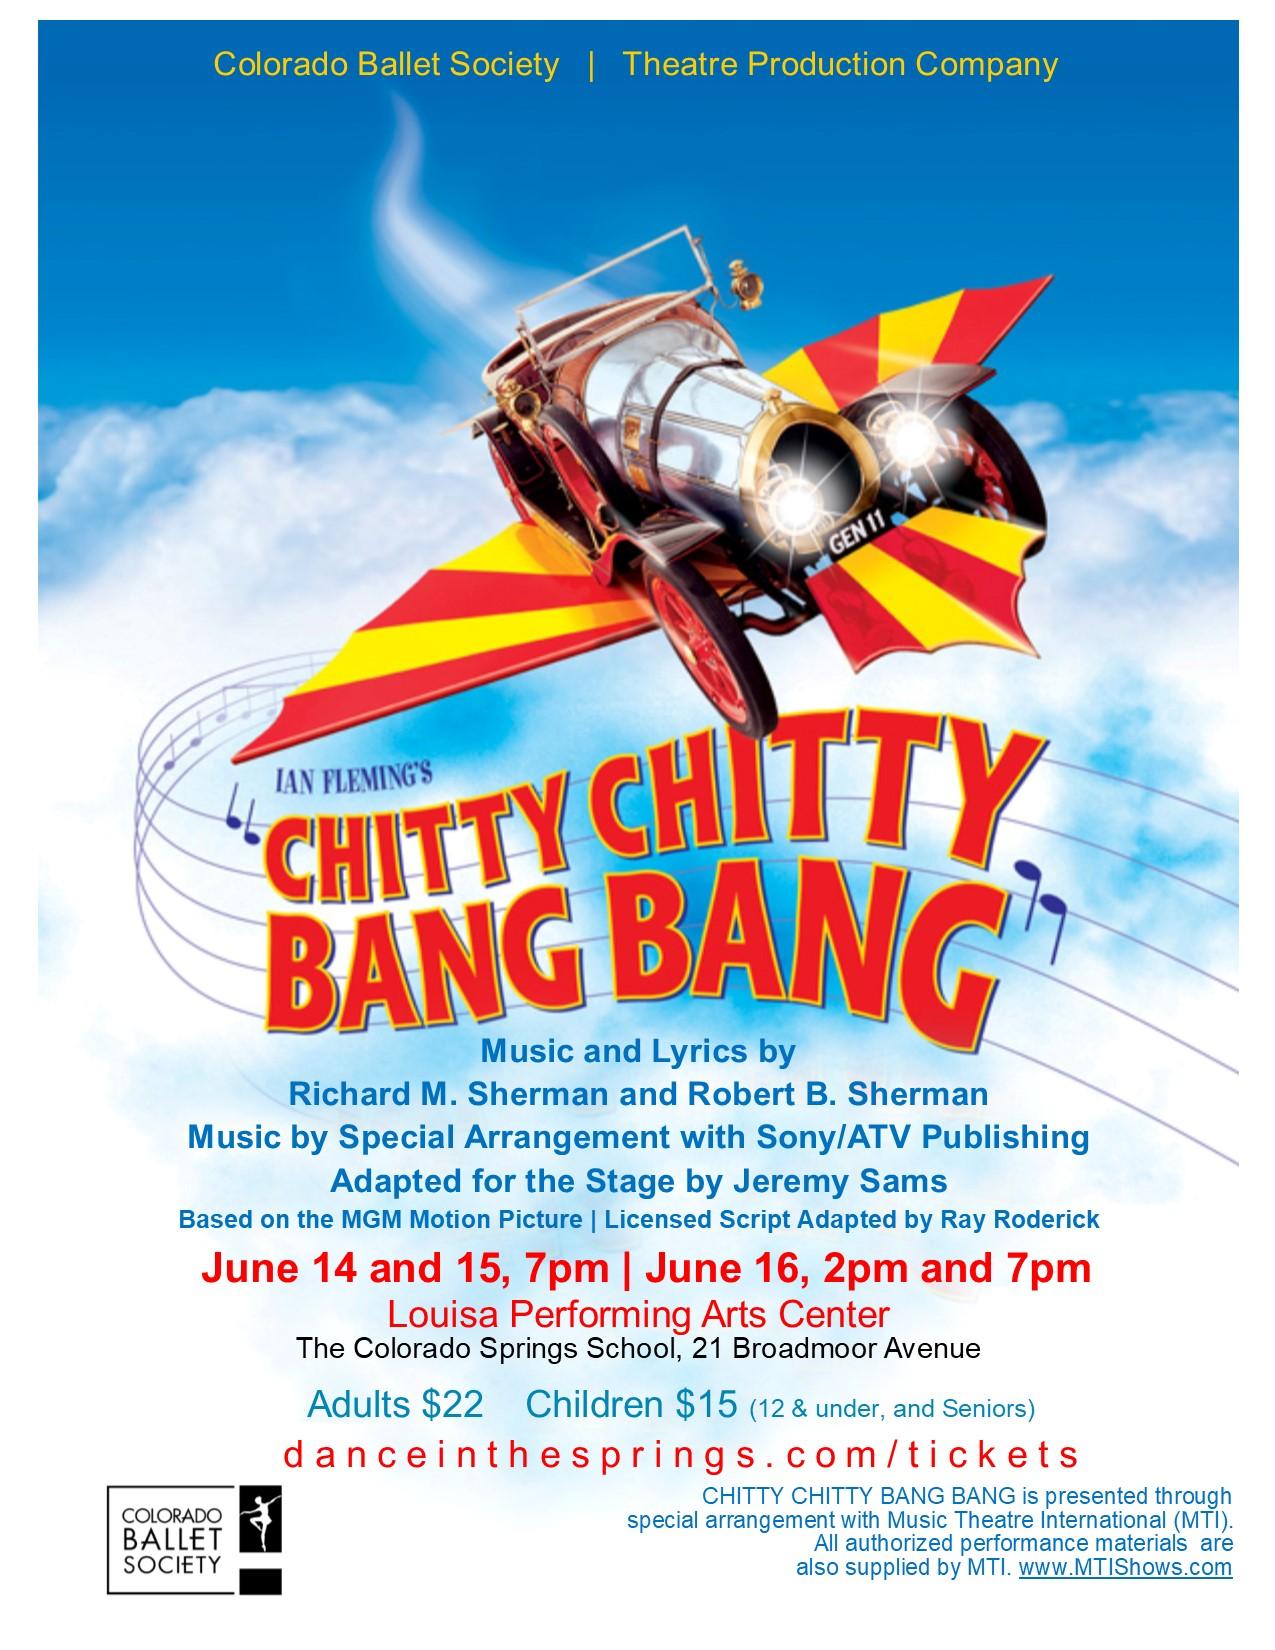 Chitty Chitty Bang Bang 2018 poster 8.5x11